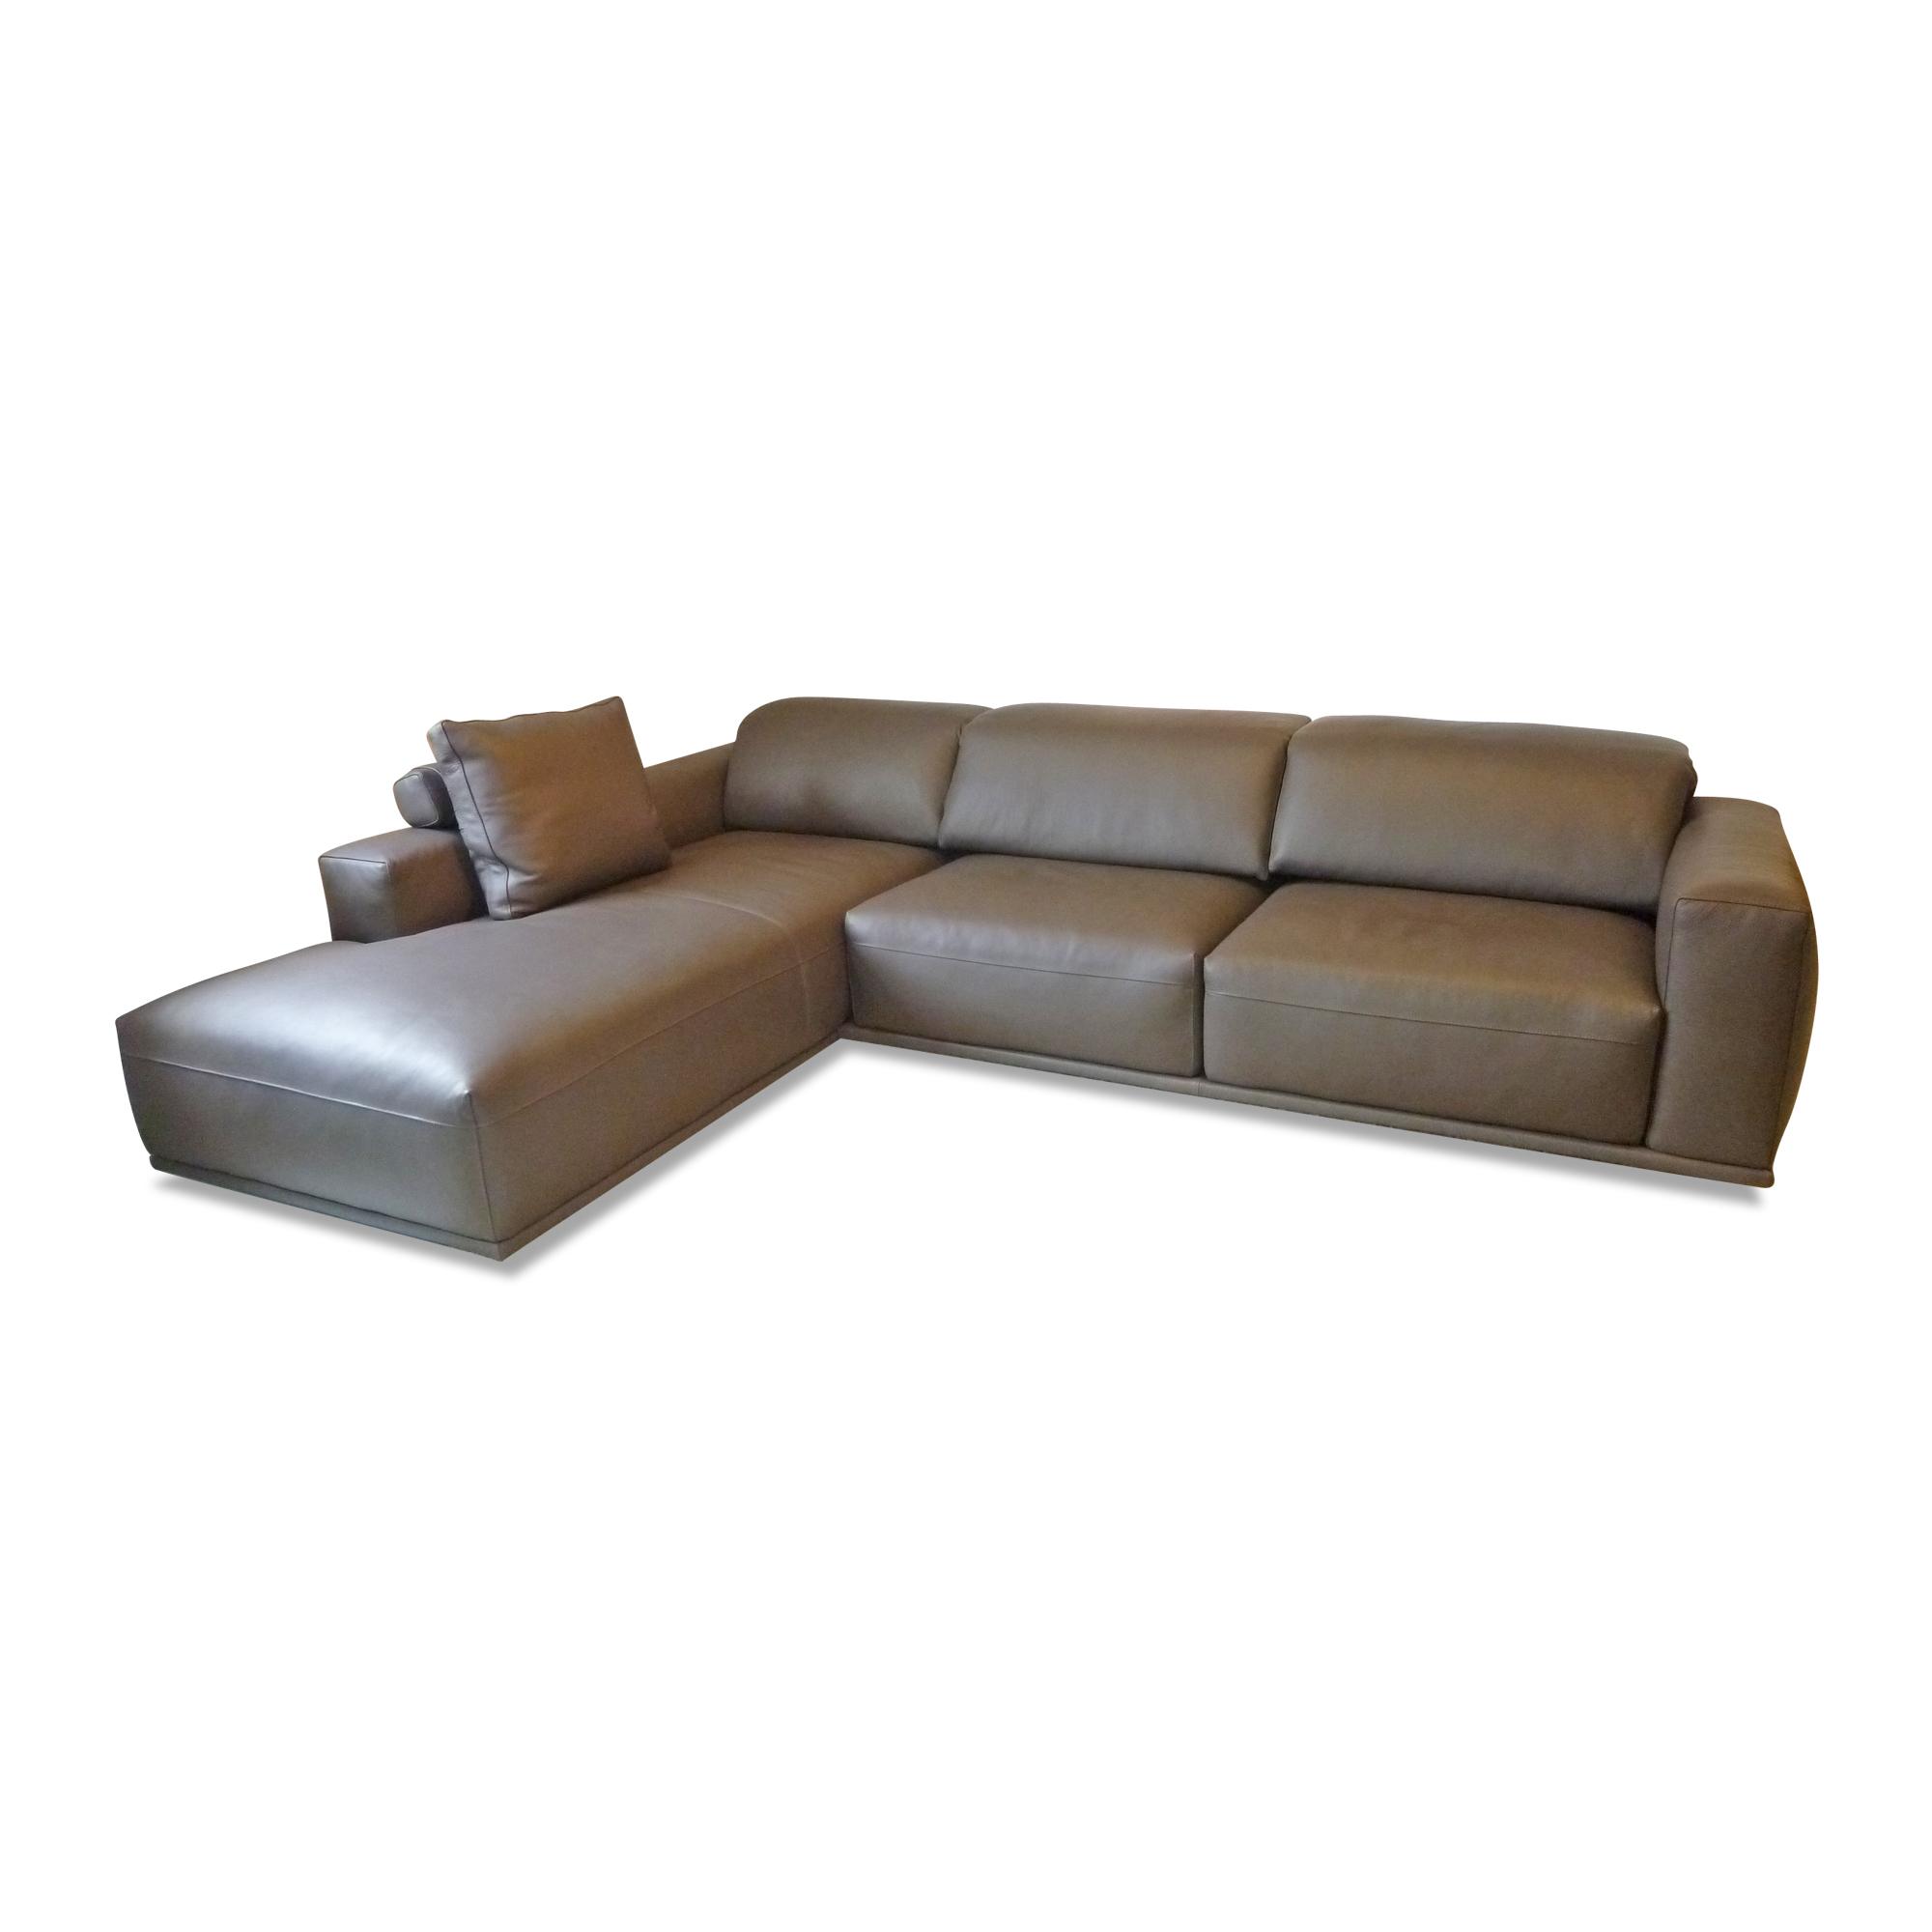 Couch Sofort Lieferbar Top Free Nach Tablet Desktop Original Gre